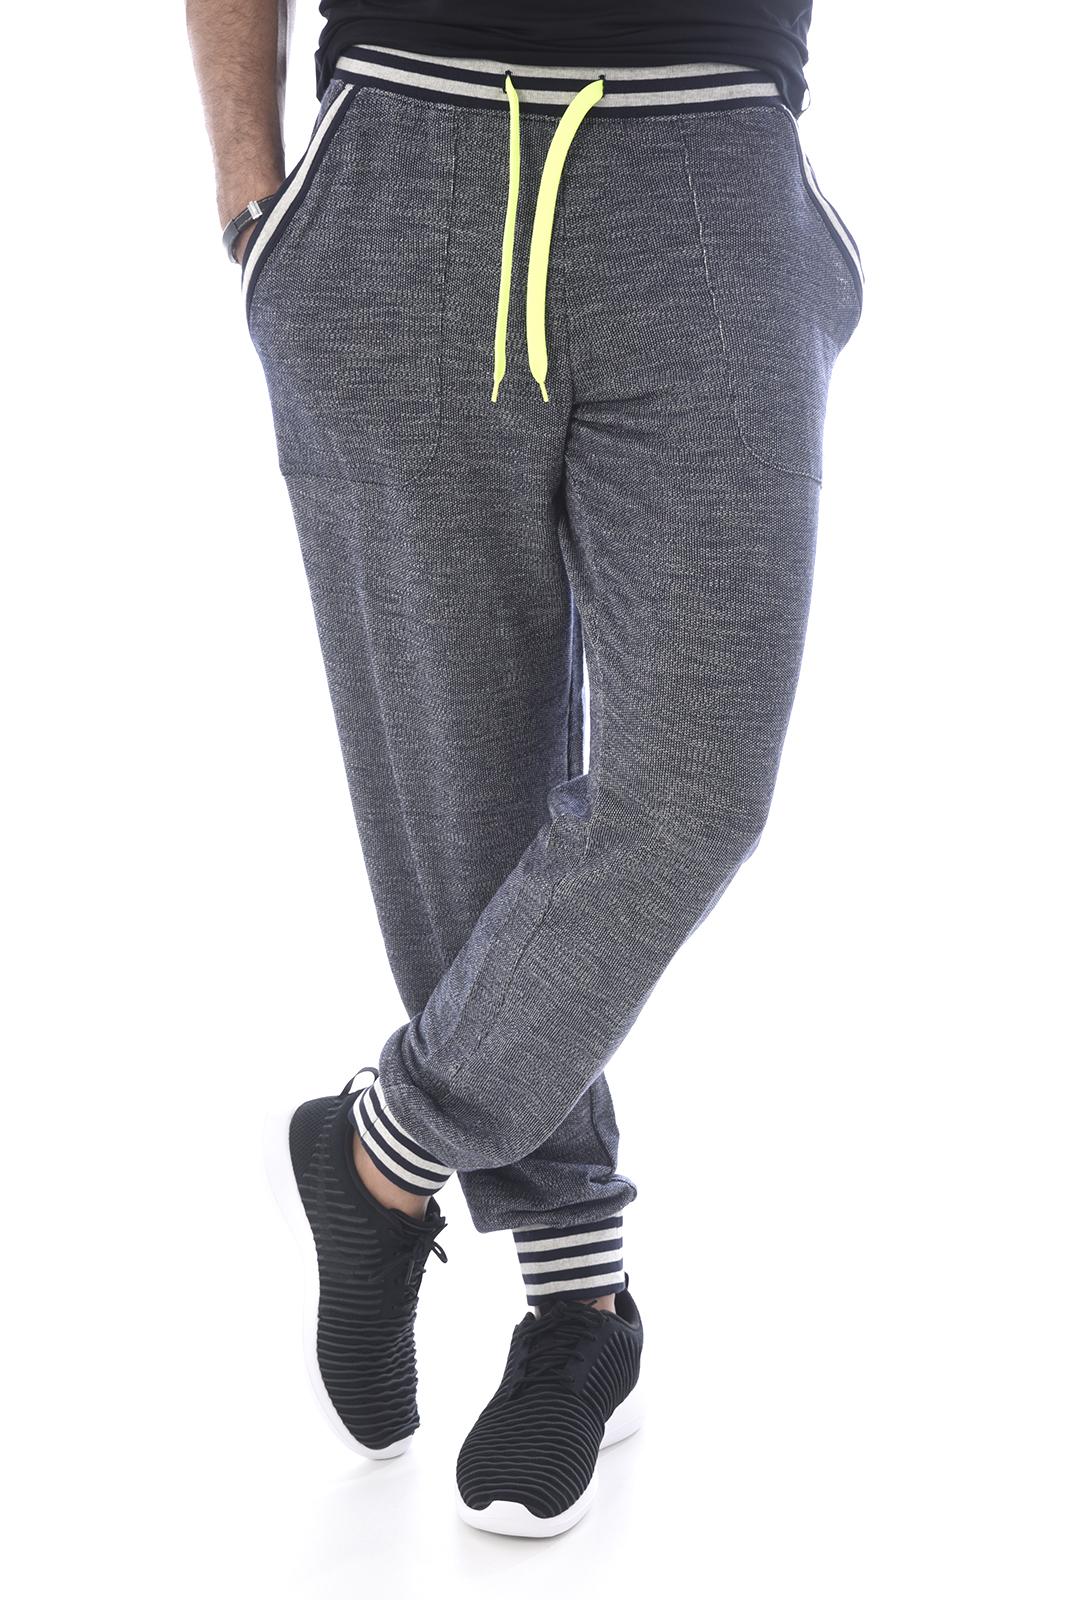 Pantalons sport/streetwear  Emporio armani 111674 7P572 00135 BLUE